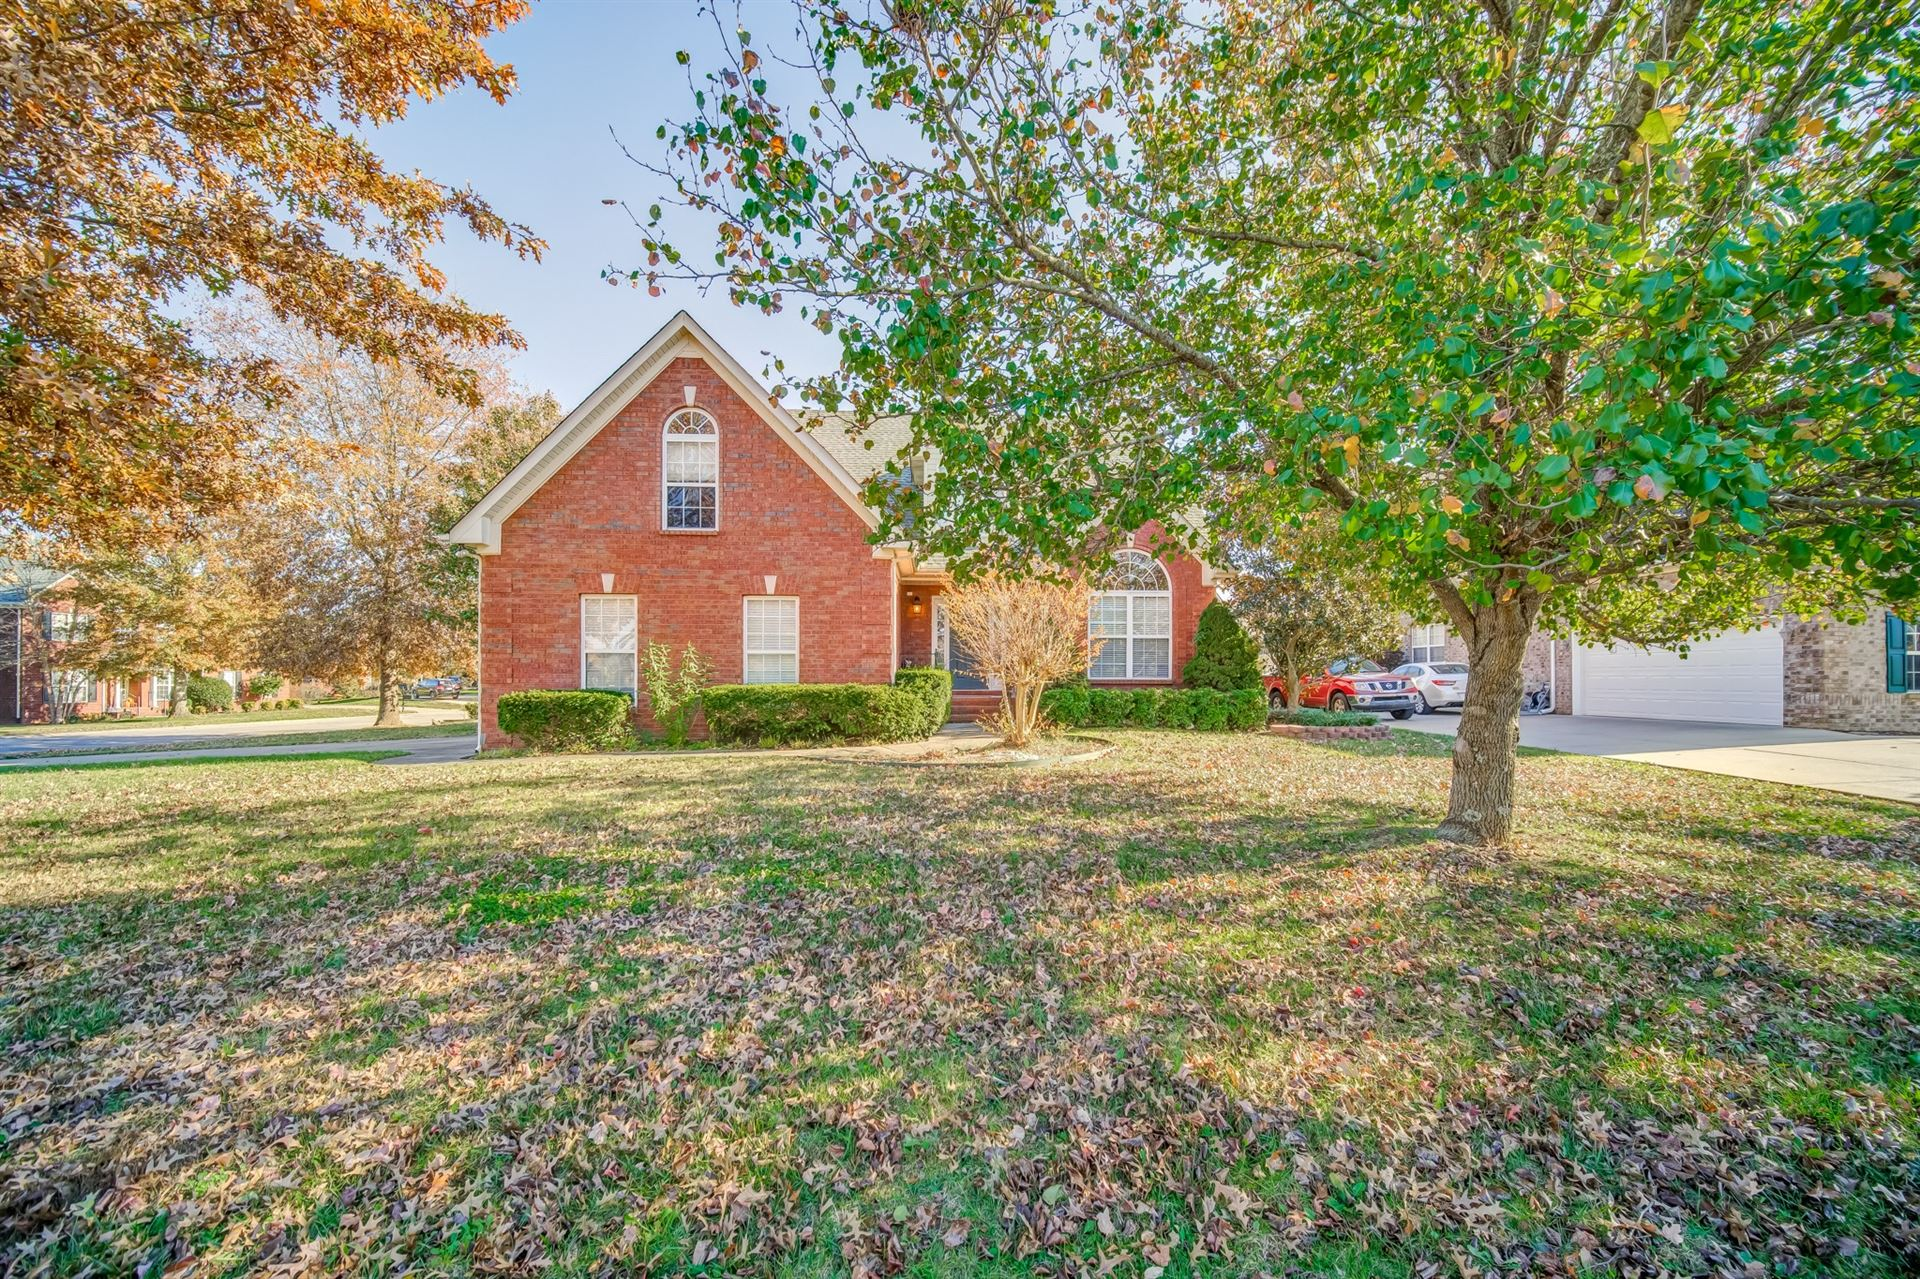 1338 Balson Dr, Murfreesboro, TN 37128 - MLS#: 2208107